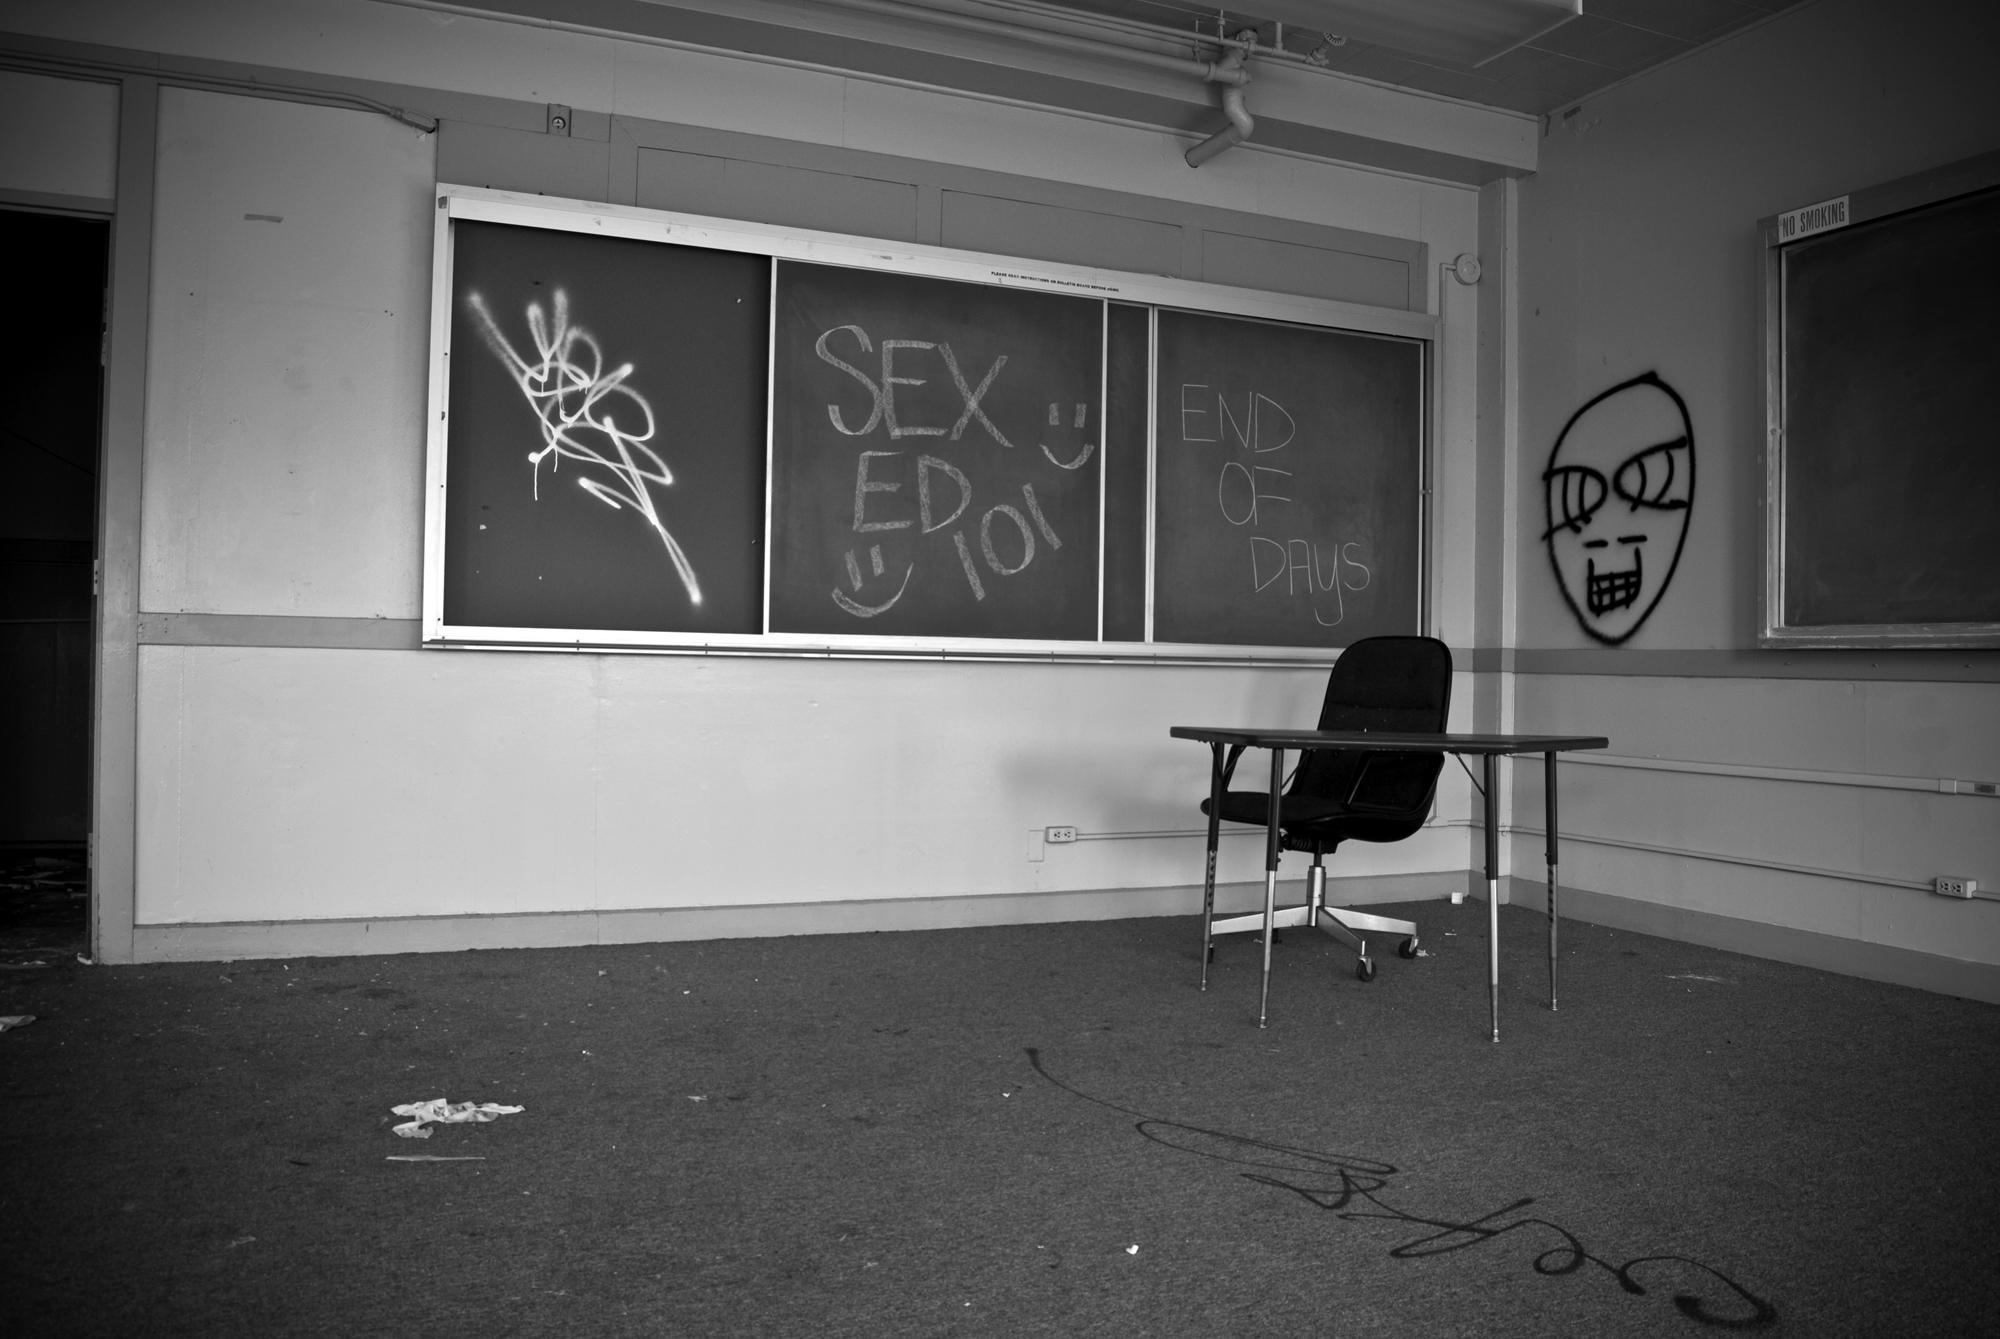 Opinion: Fremont Students Deserve LGBTQ+ Inclusive Sex Education